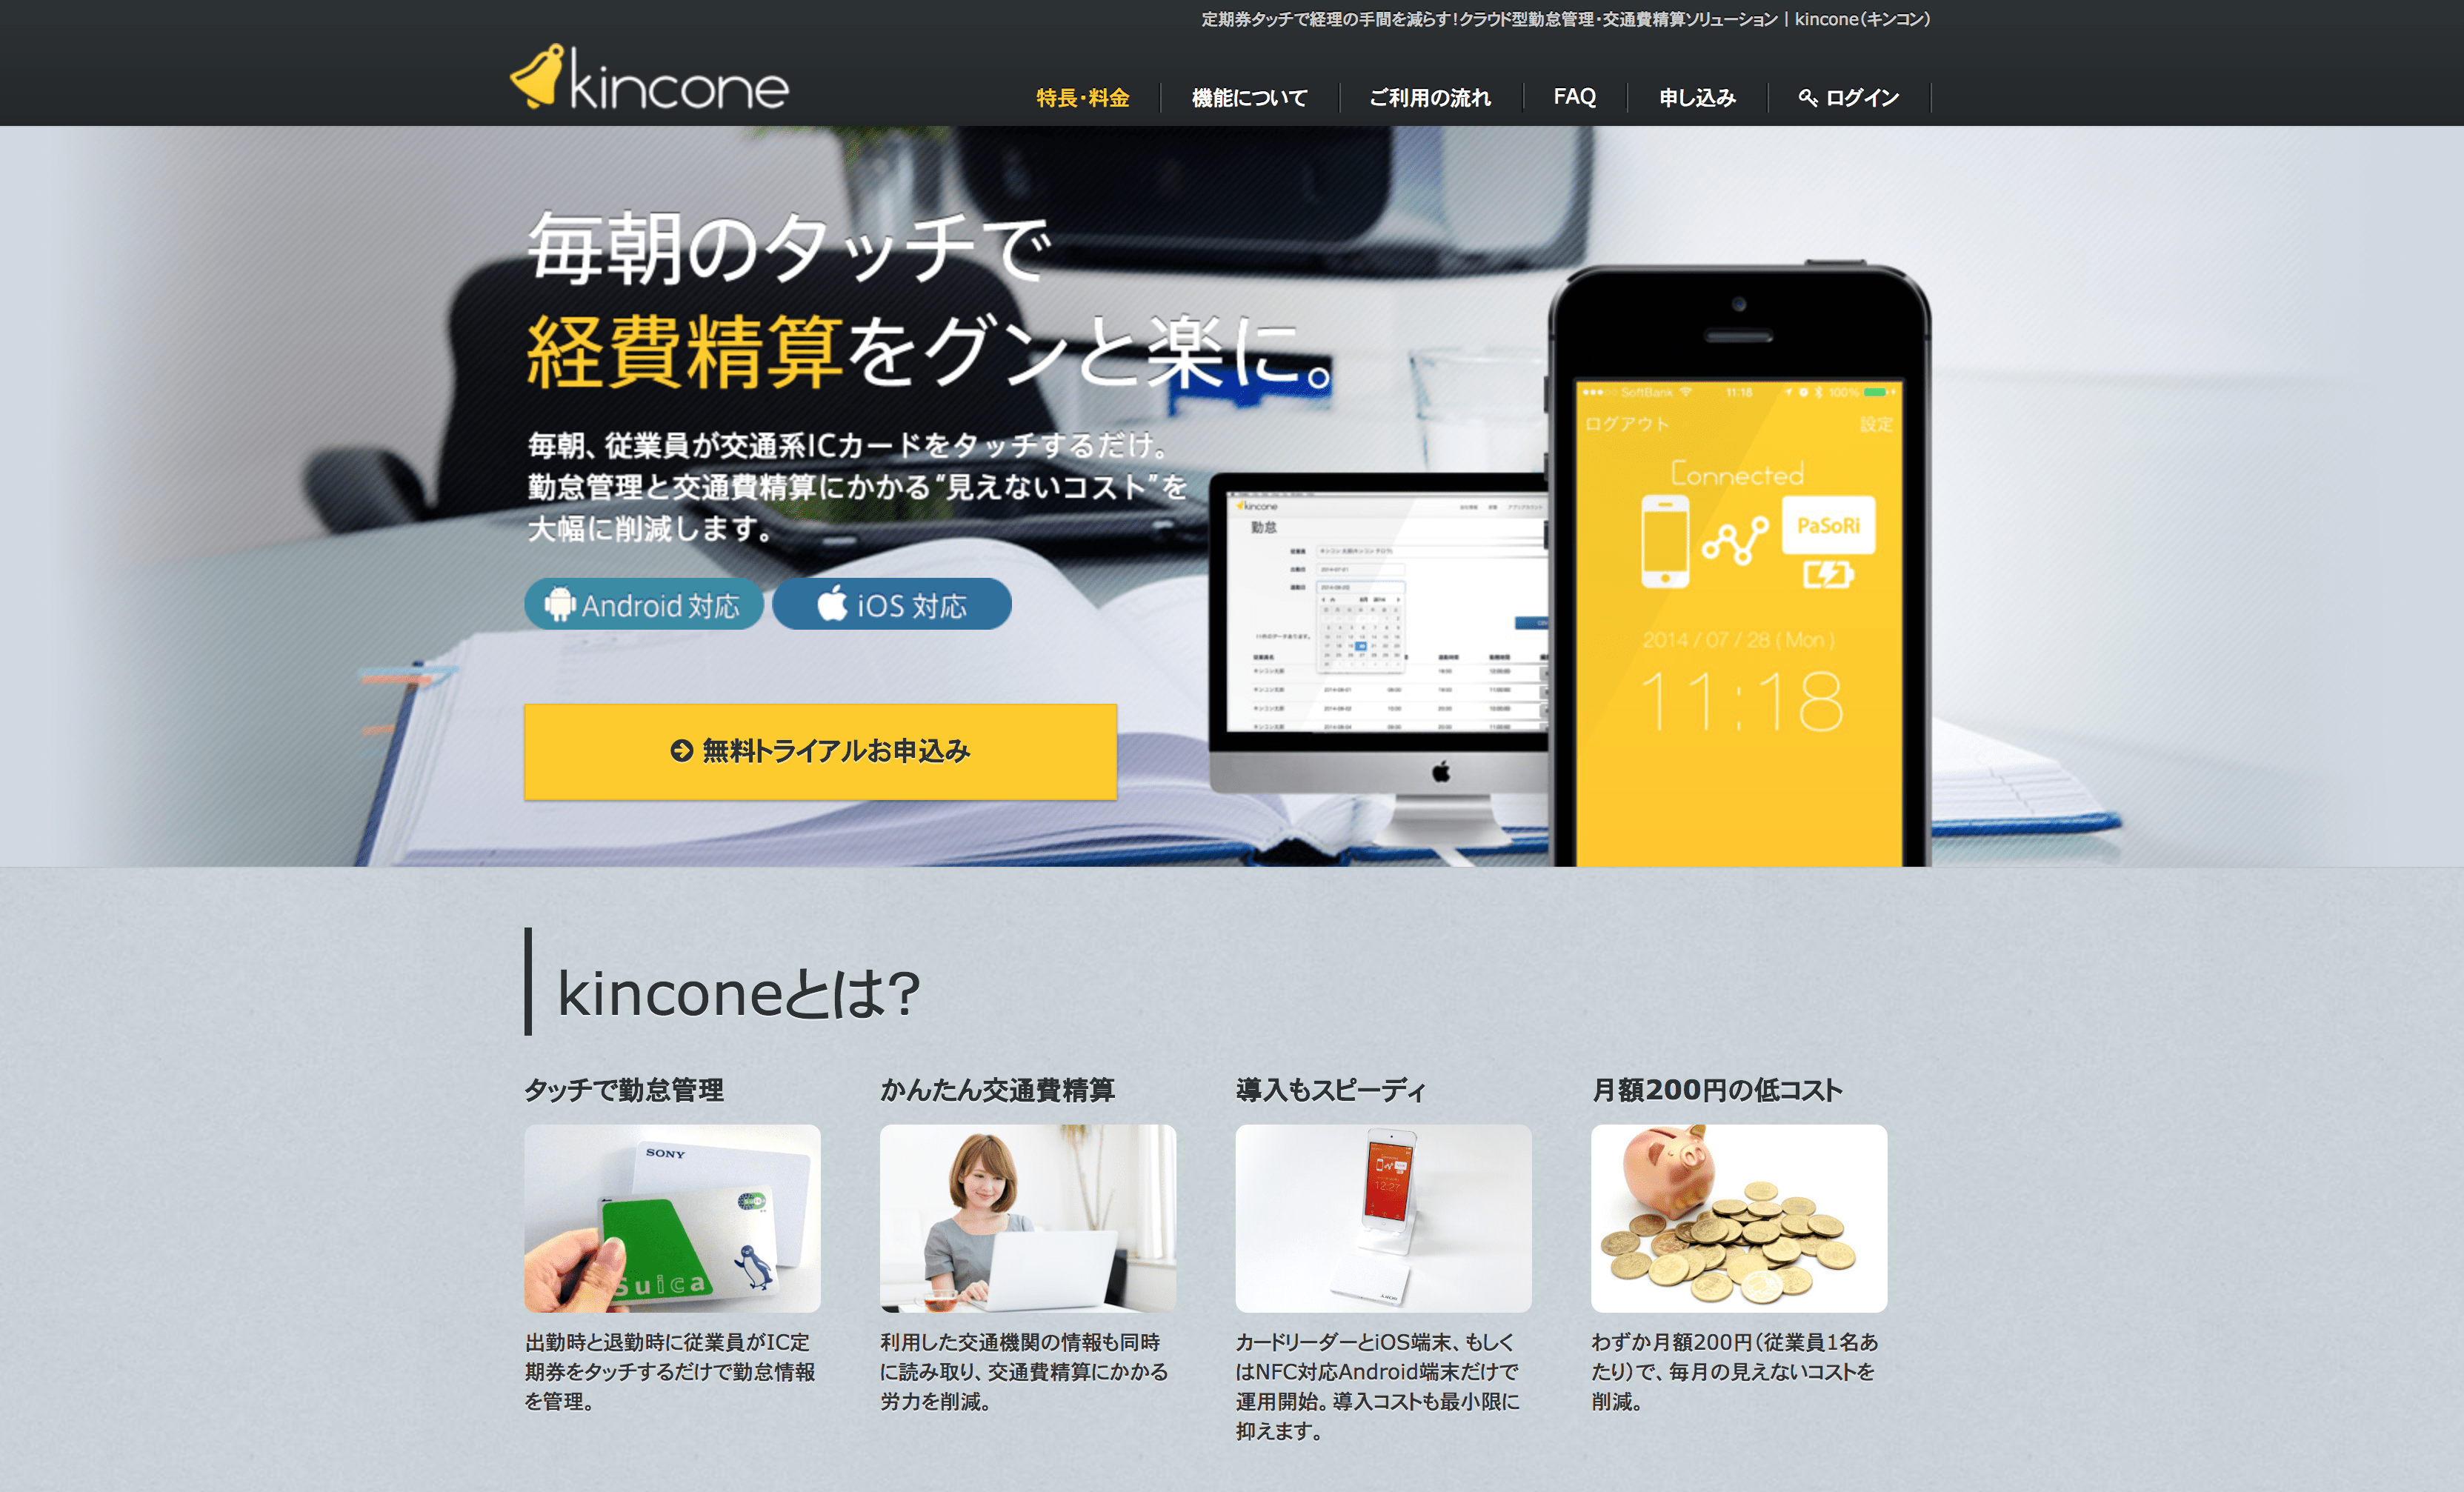 kinconeキャプチャ画像